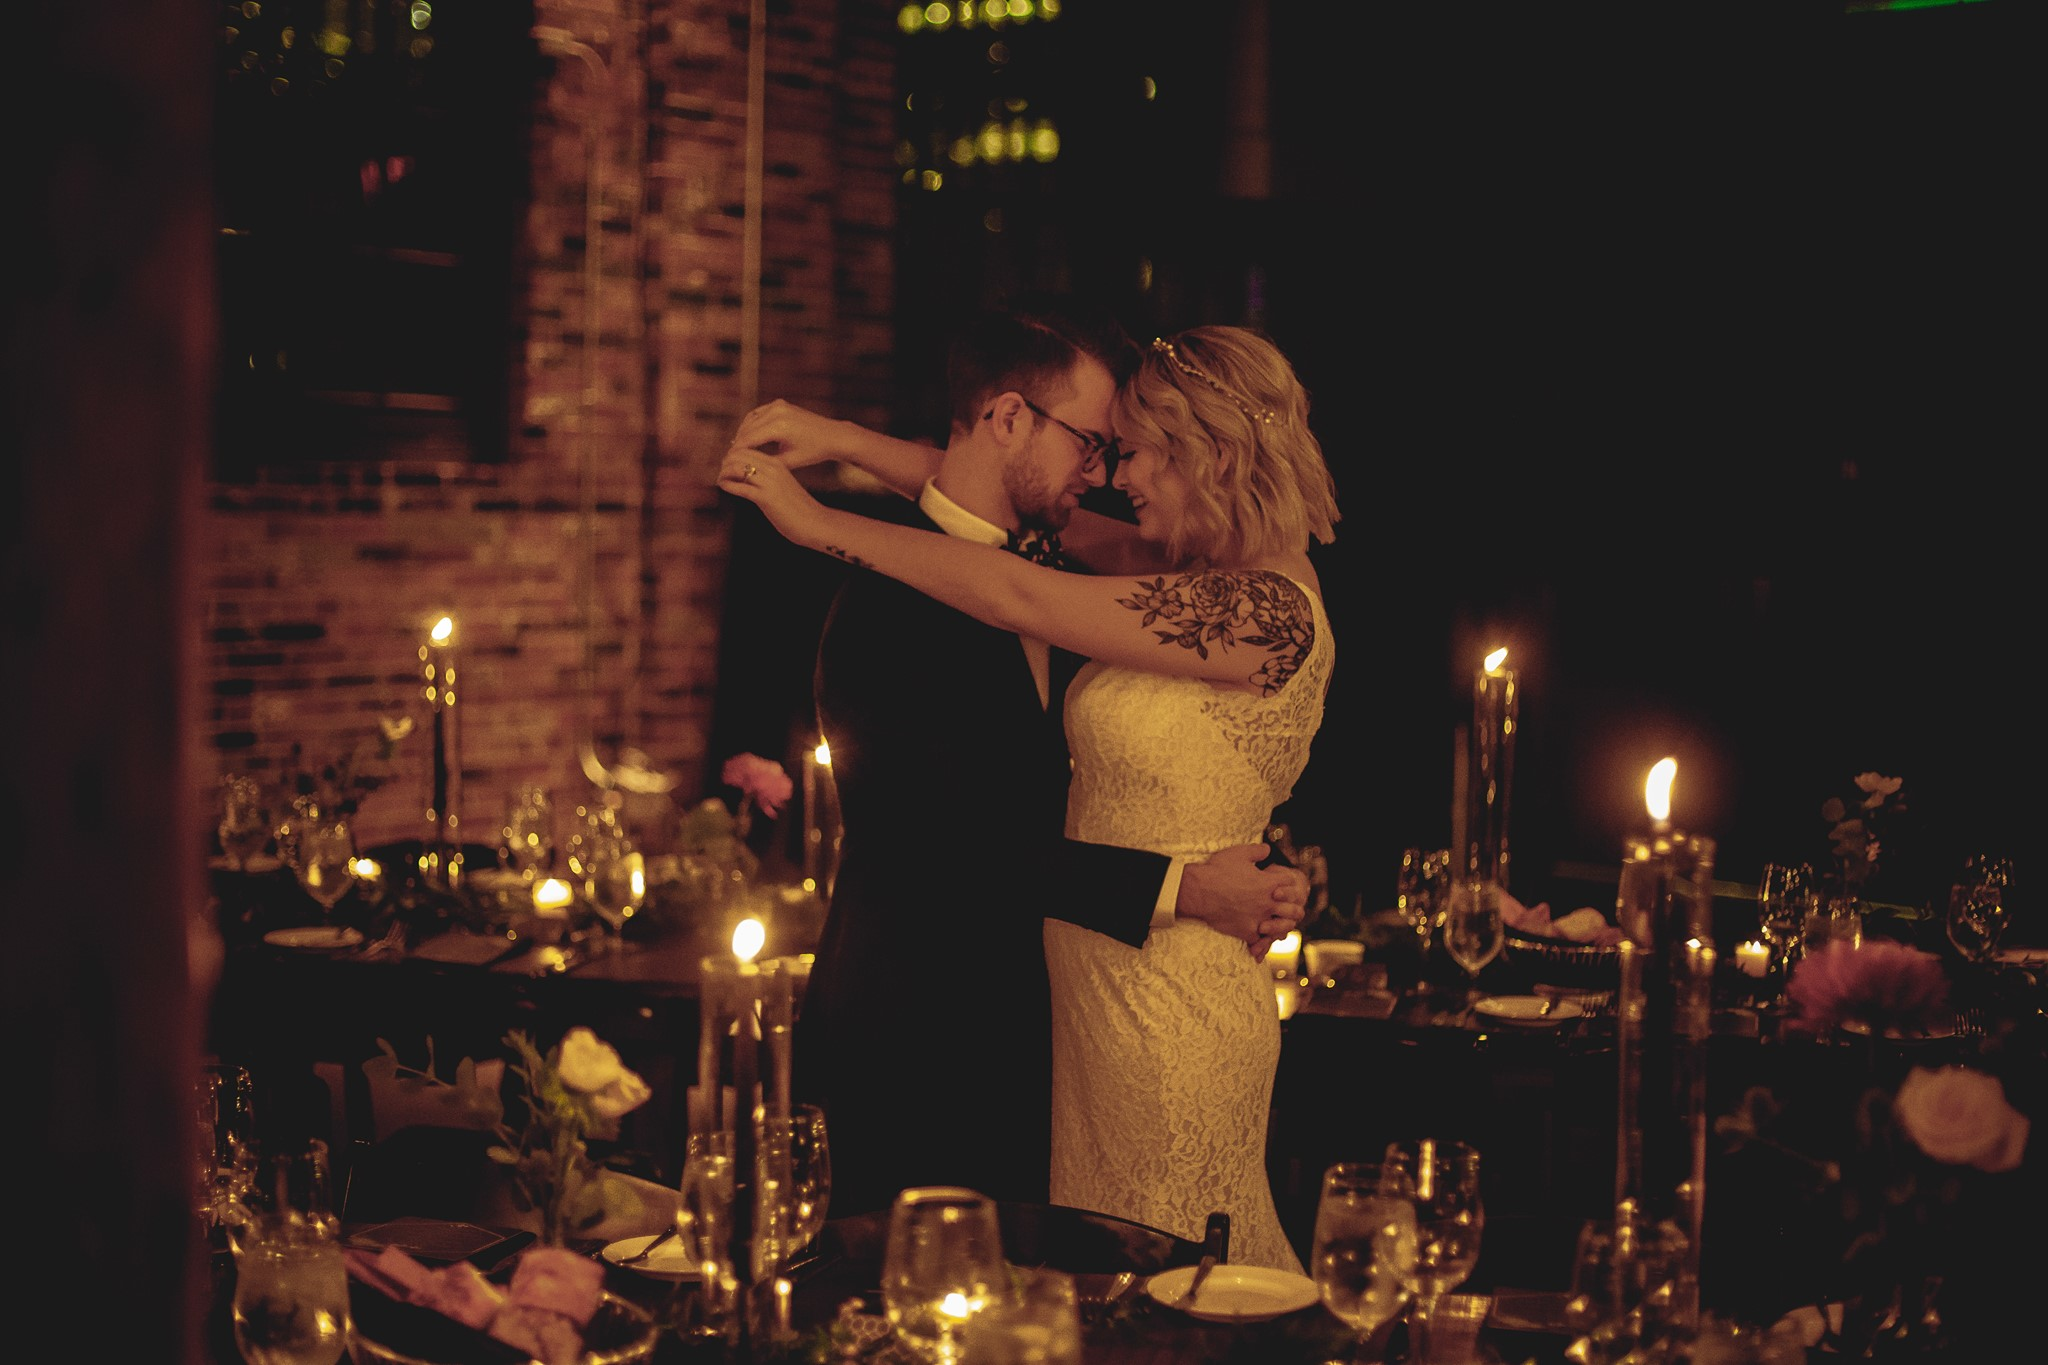 Calderone & Co. Luxury Weddings and Events